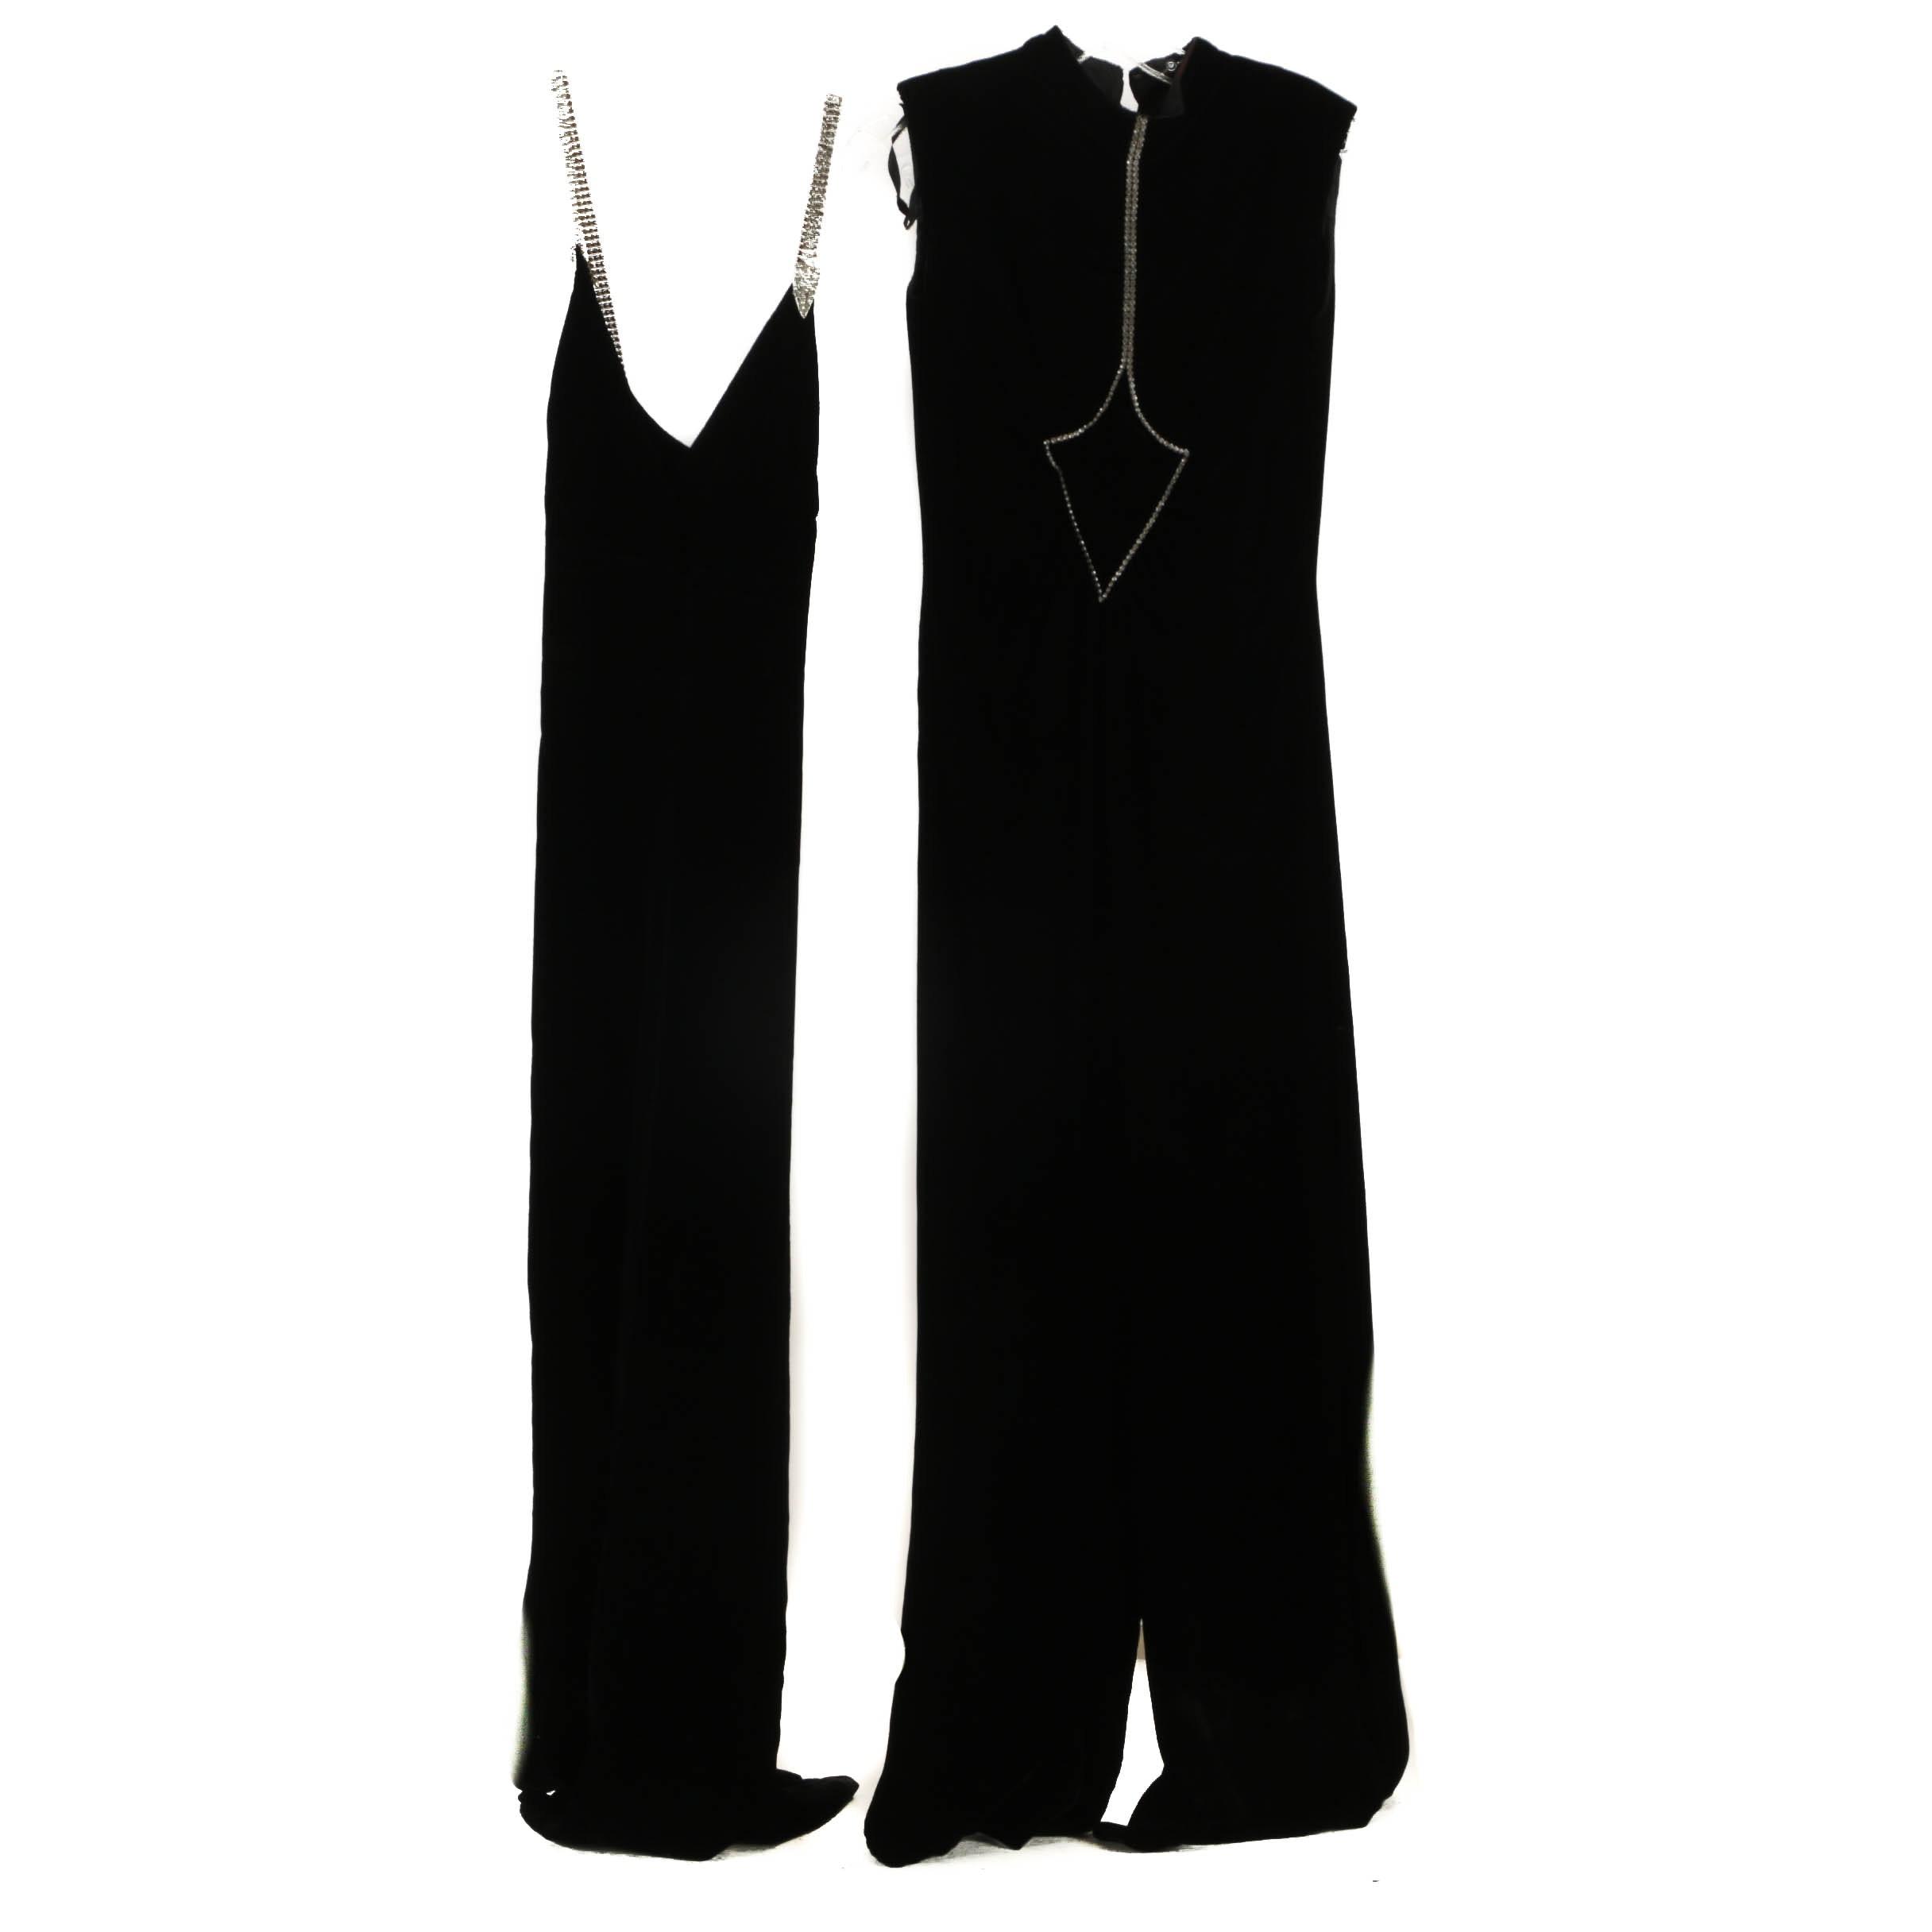 Vintage Black Velvet Evening Gown and Jumpsuit